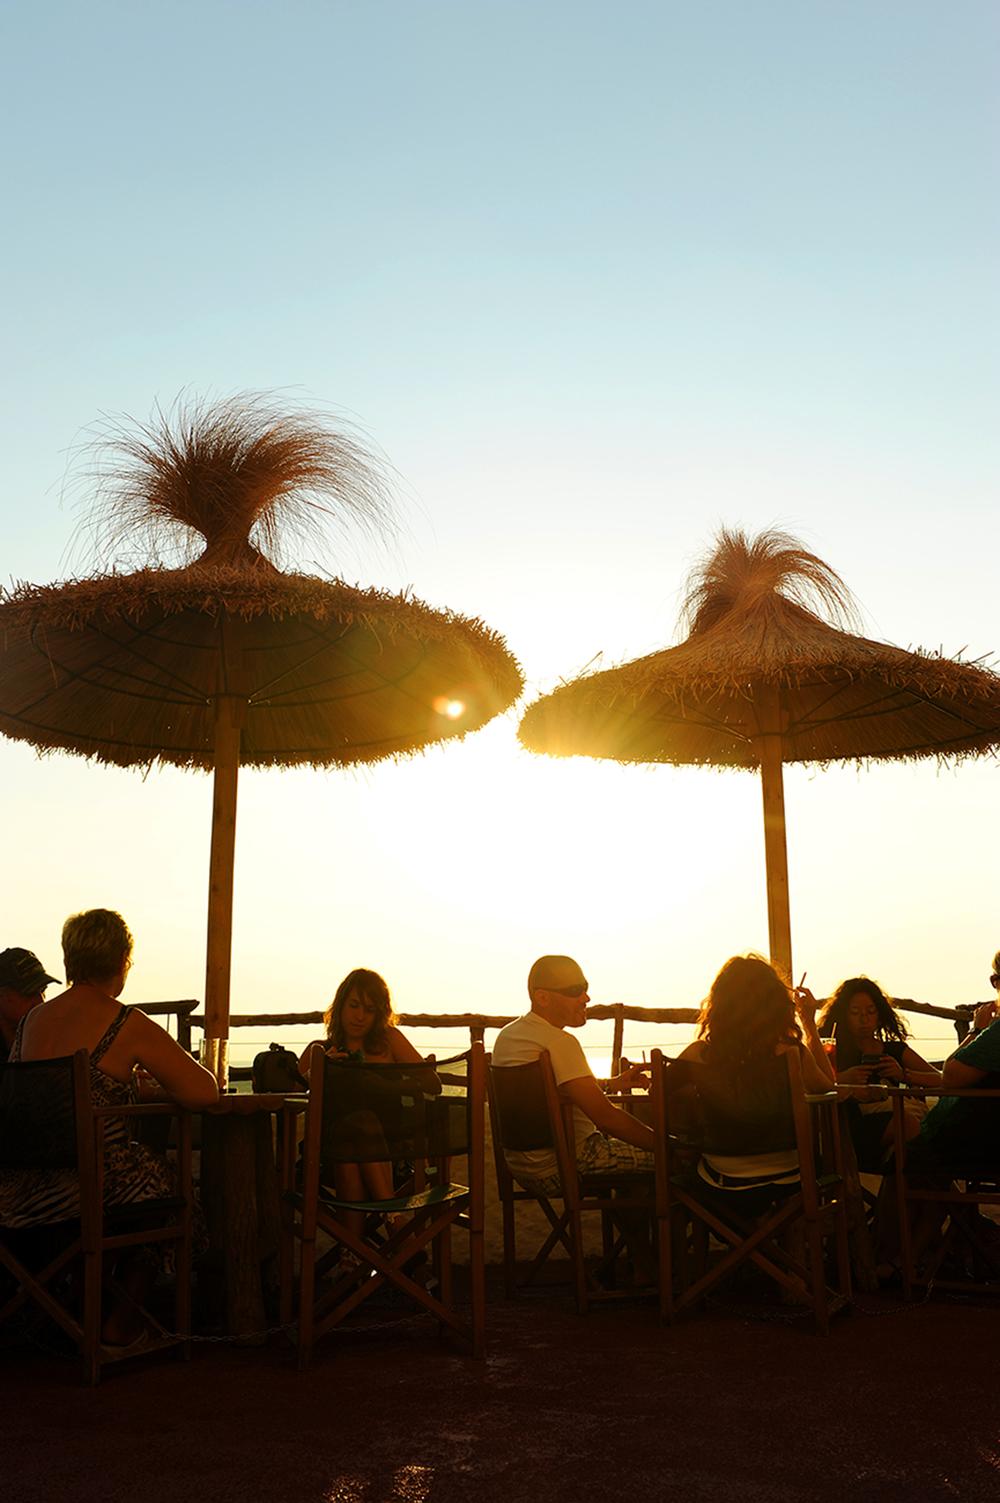 Auringonlasku, ilta, terassi, Espanja, Menorca, matkablogi, matka